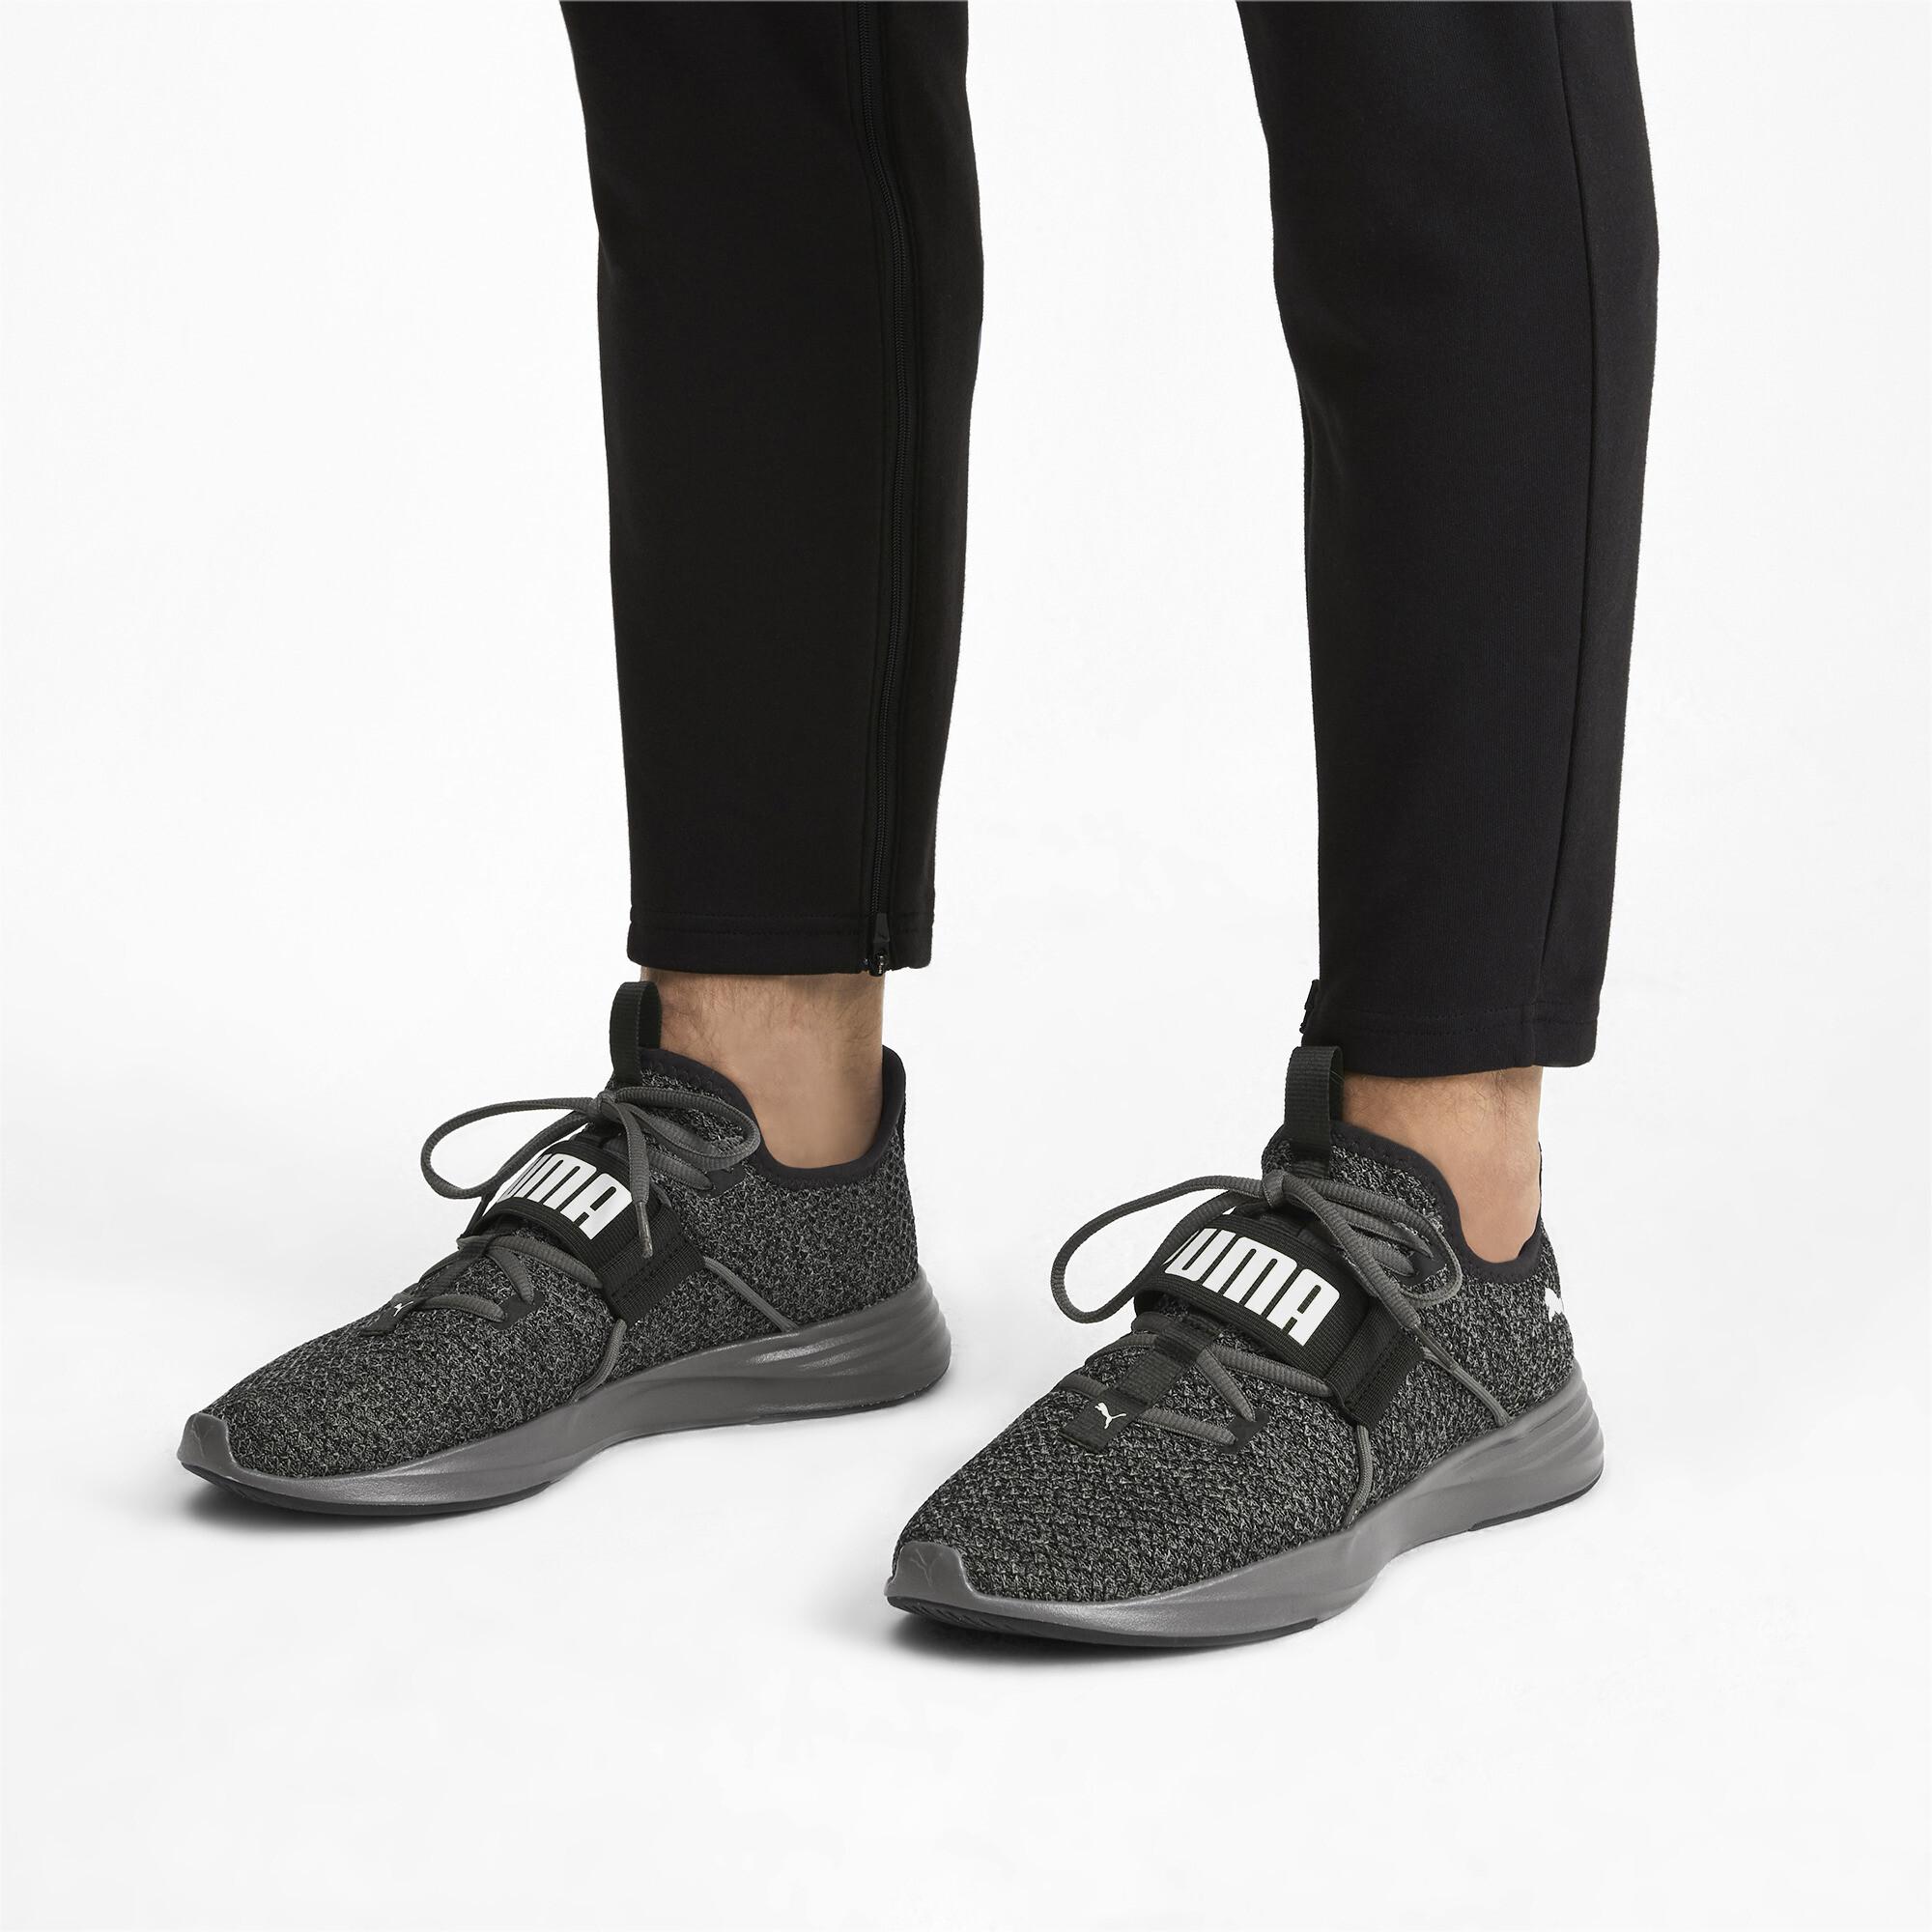 PUMA-Men-039-s-Persist-XT-Knit-Training-Shoes thumbnail 12